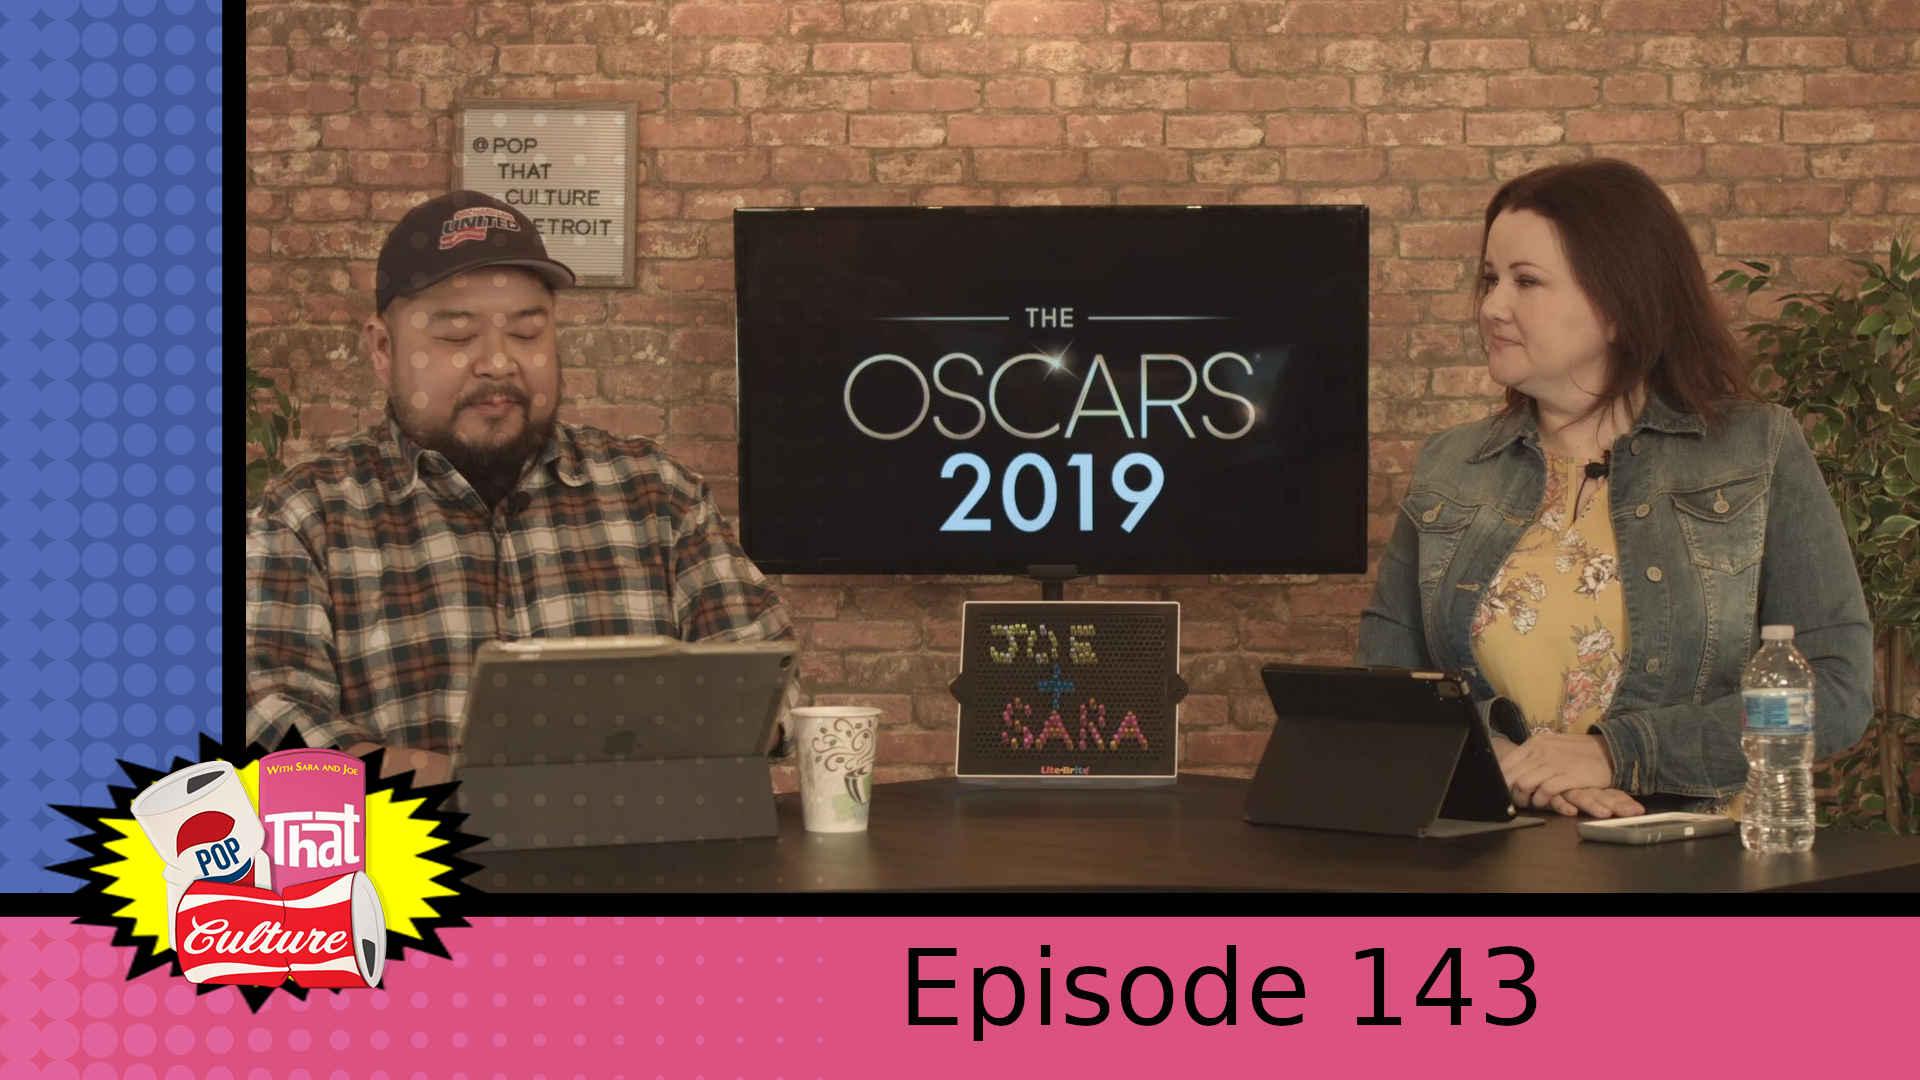 Pop That Culture - Episode 143